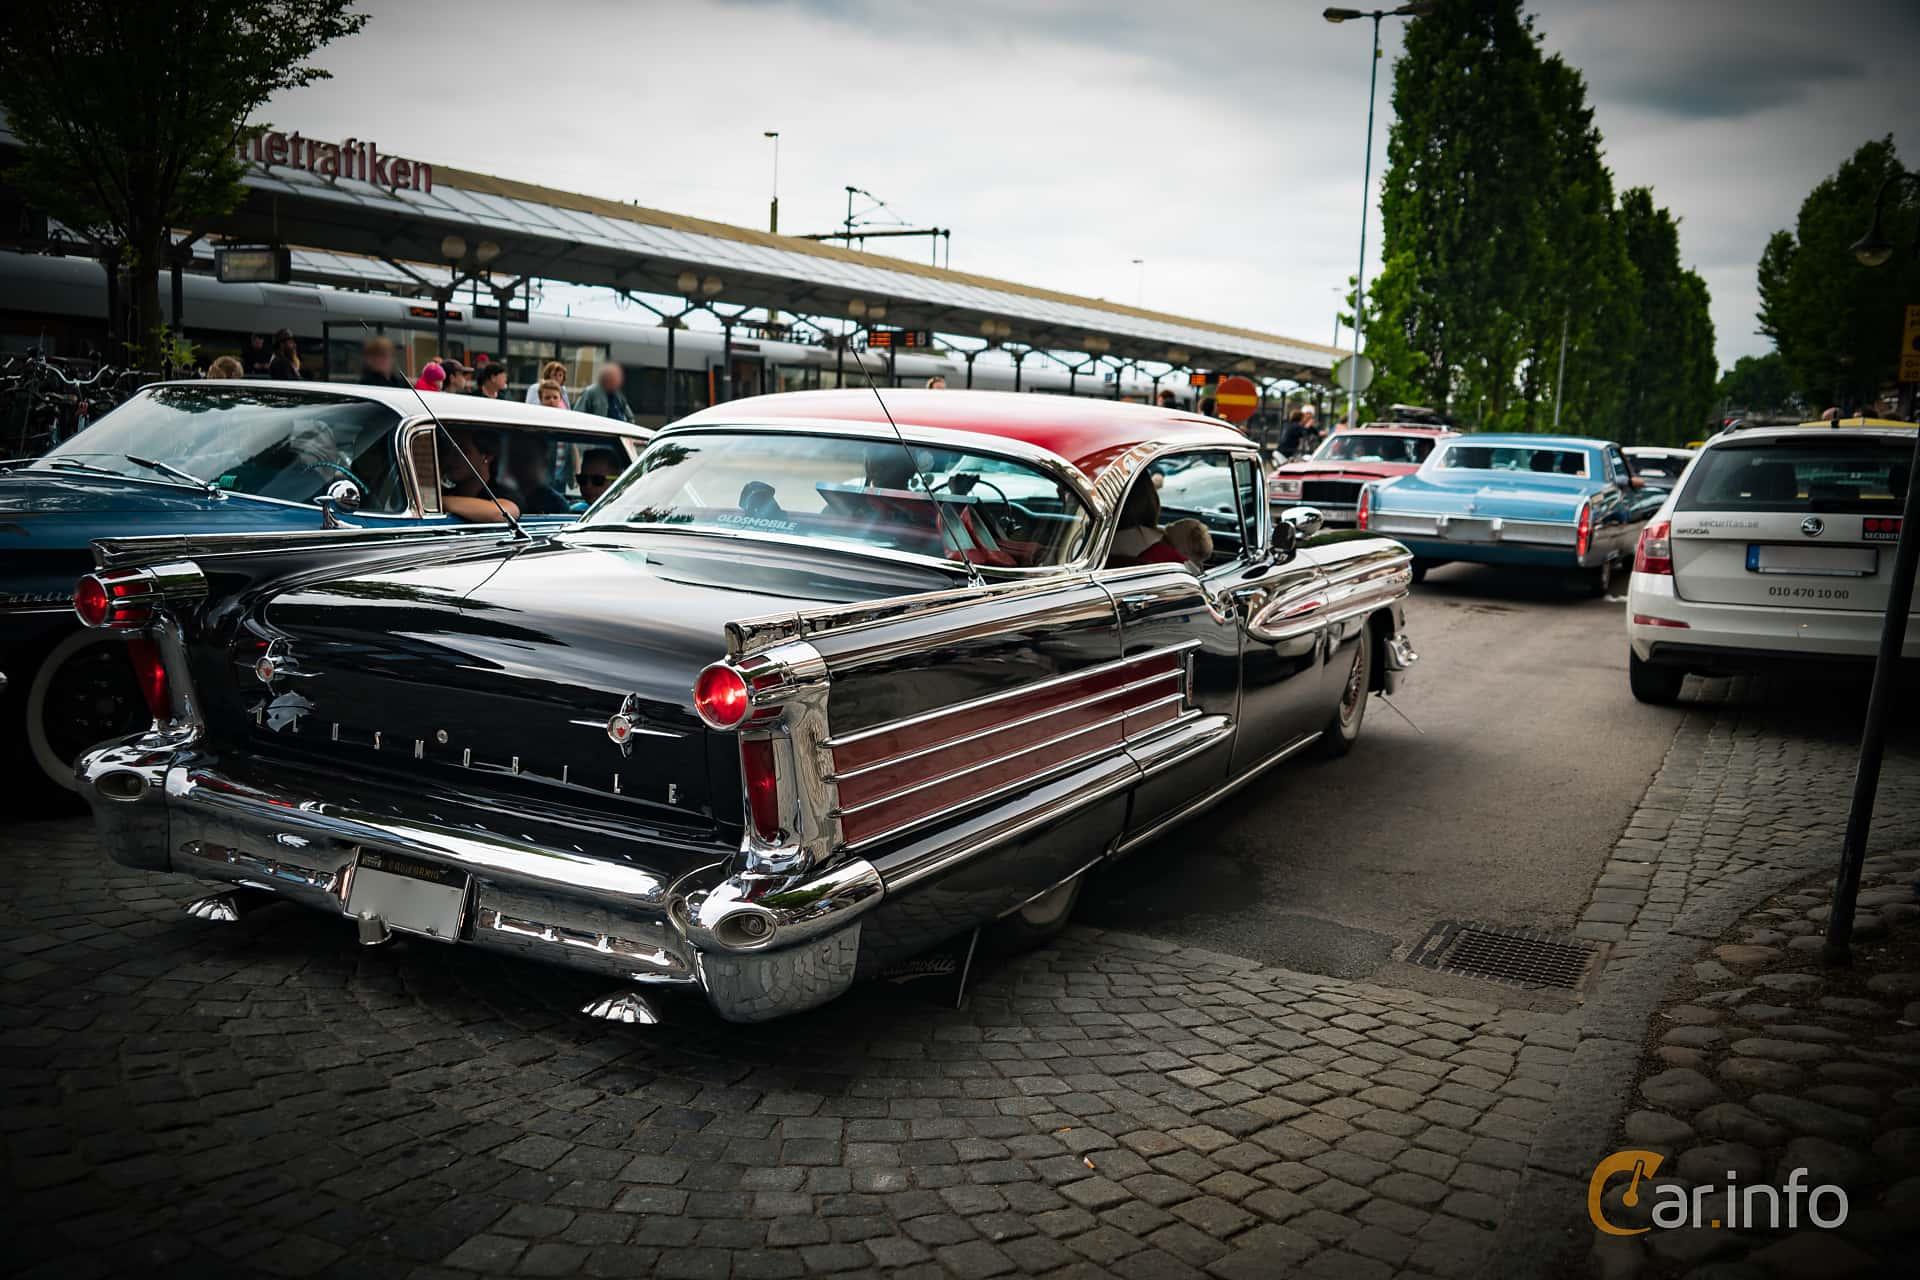 Oldsmobile Ninety-Eight Holiday Sedan 6.1 V8 Hydra-Matic, 309hp, 1958 at Hässleholm Power Start of Summer Meet 2016